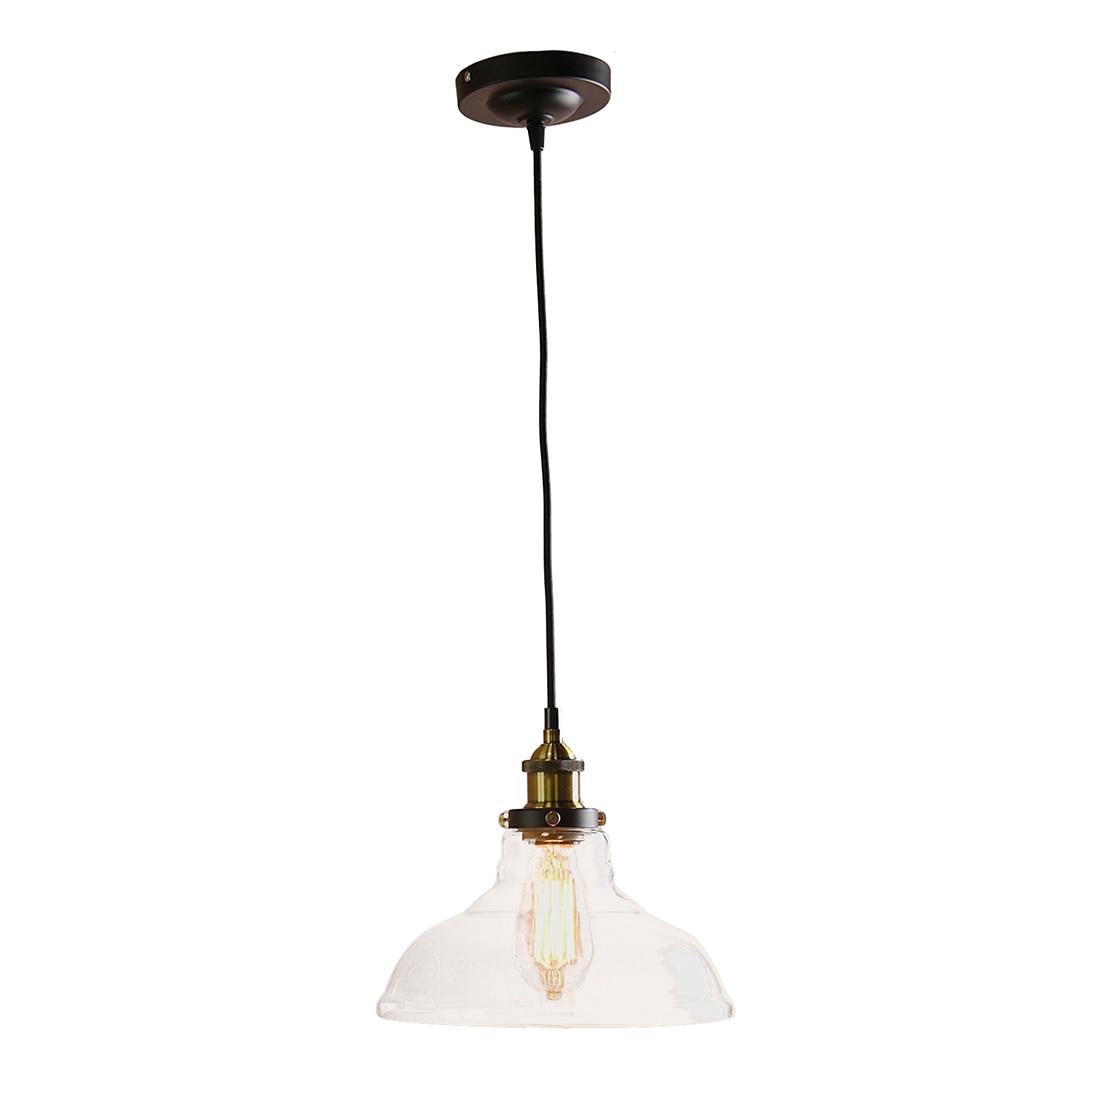 Modern Transparent Vintage Industrial 1 Light Iron Body Glass Shade Loft Coffee Bar Kitchen Pendant Lamp Light